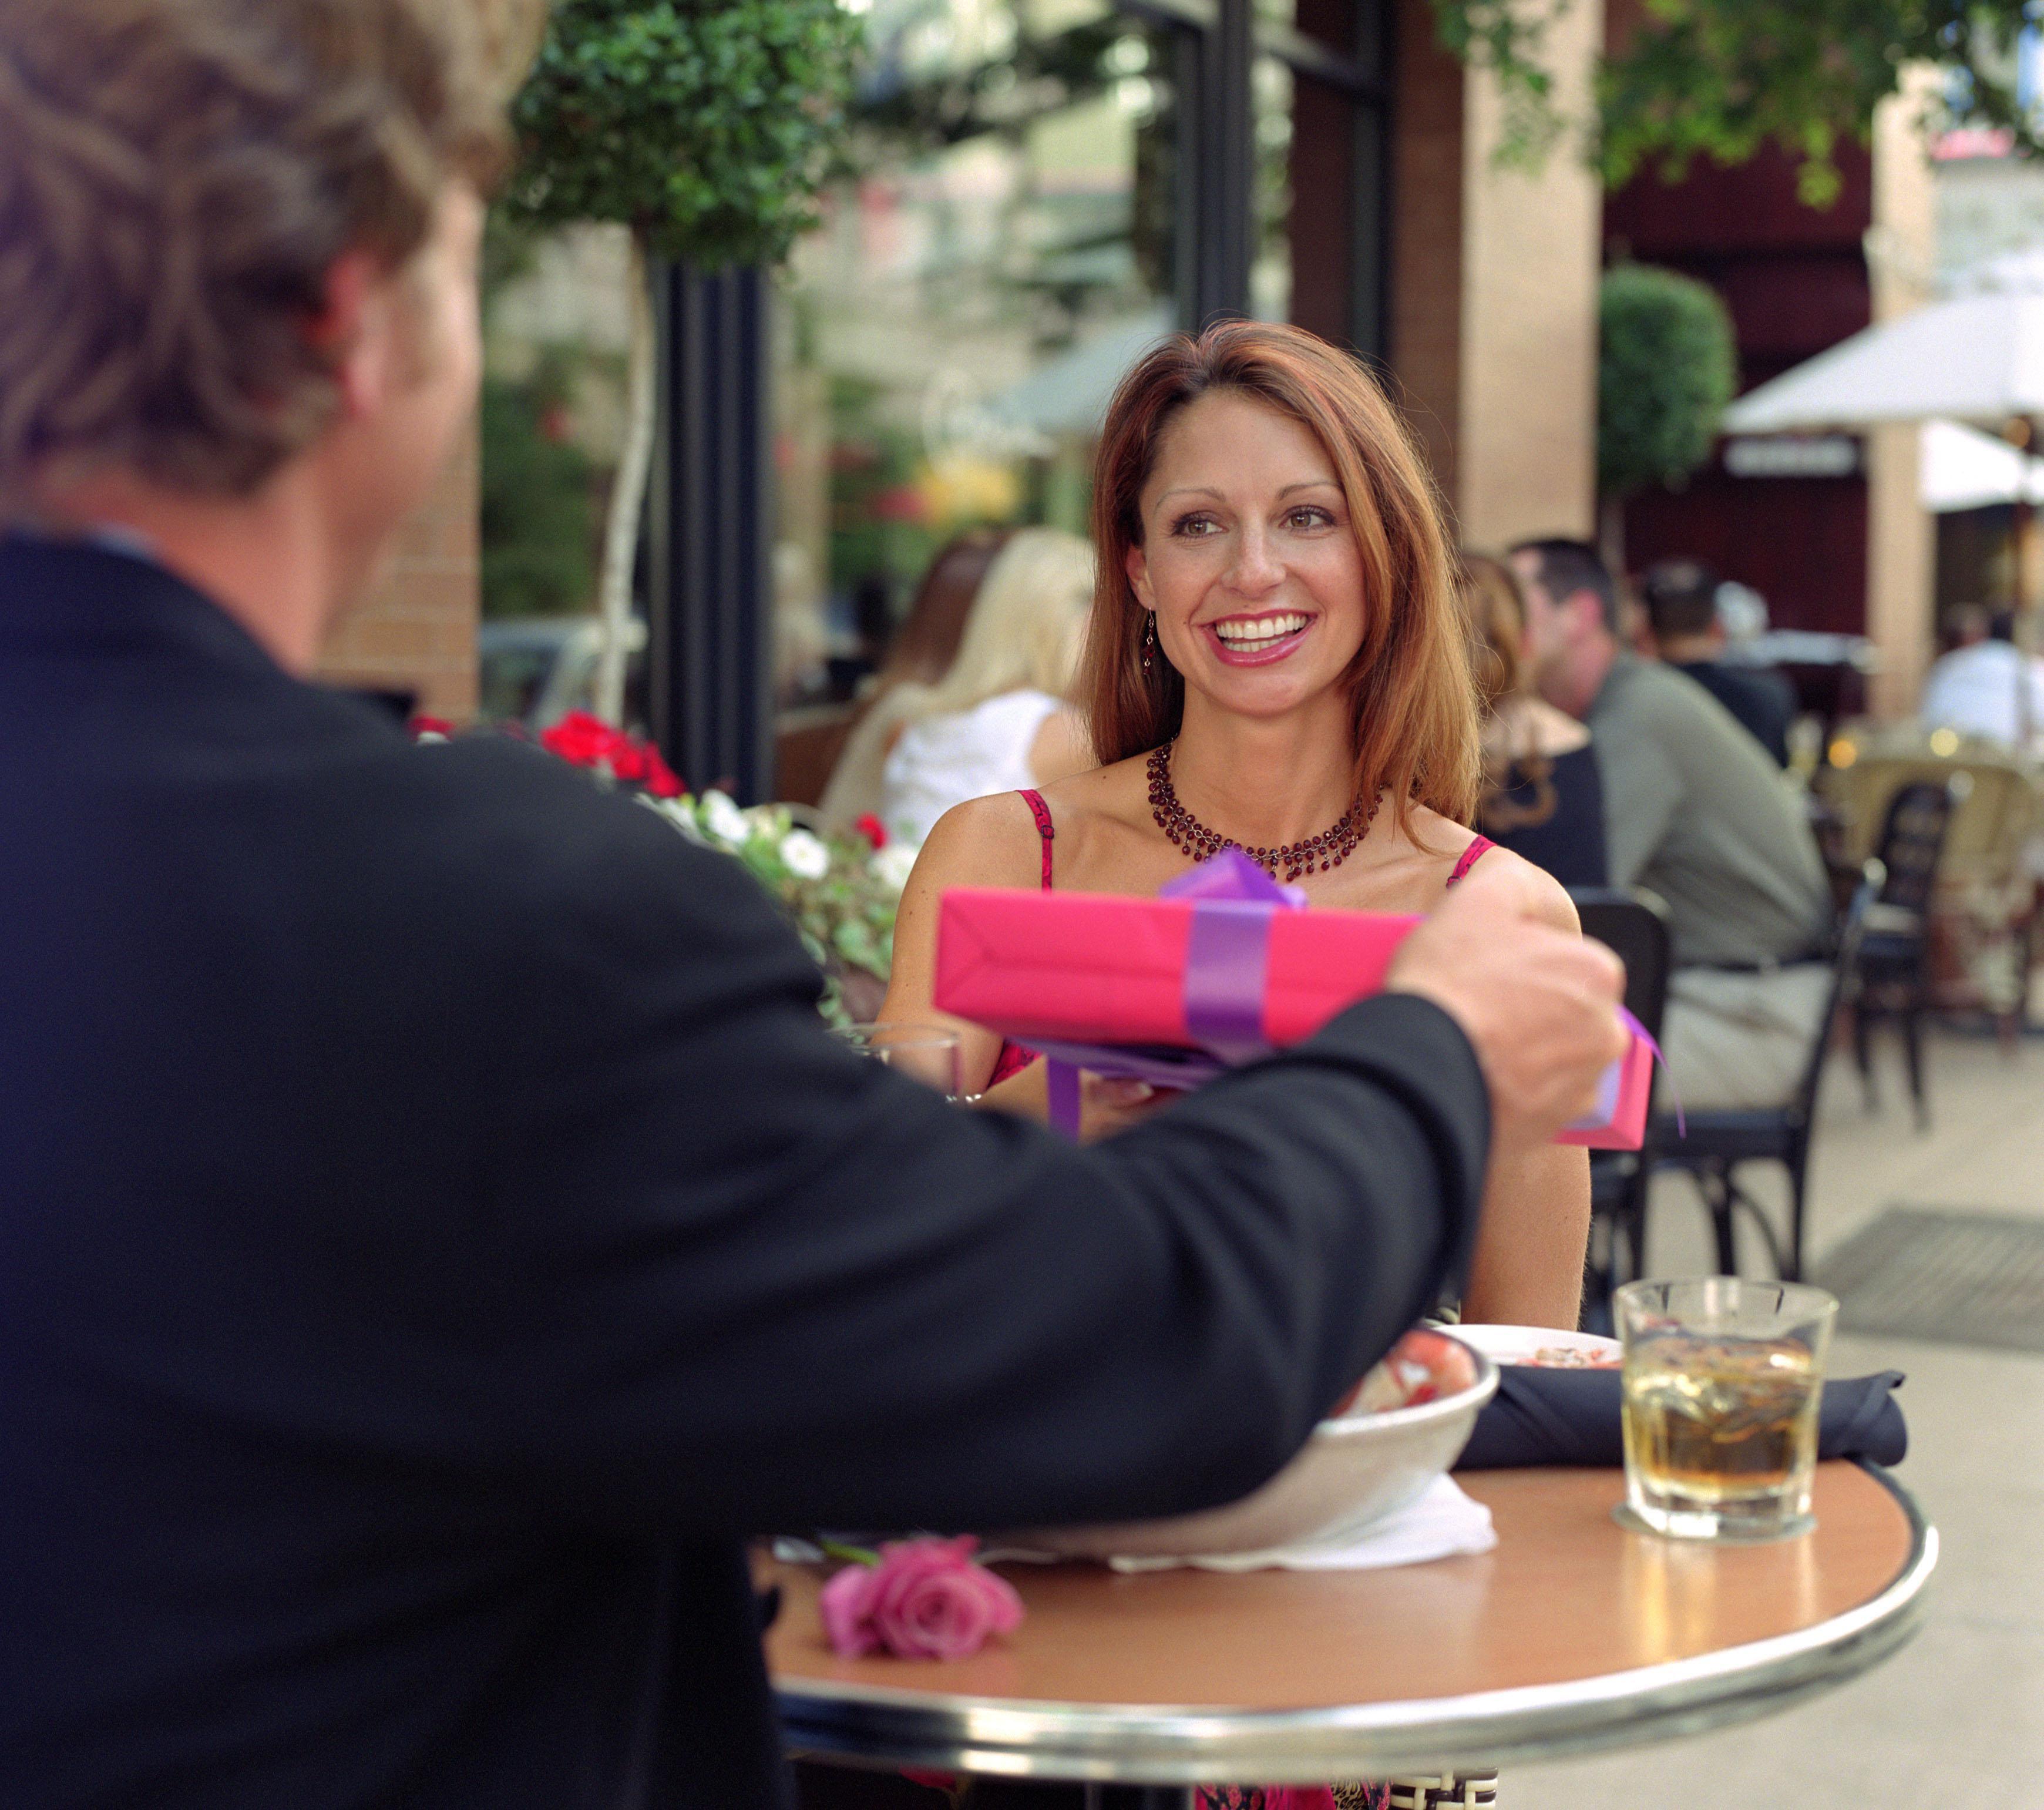 7th wedding anniversary ideas and symbols how to celebrate your 1st wedding anniversary buycottarizona